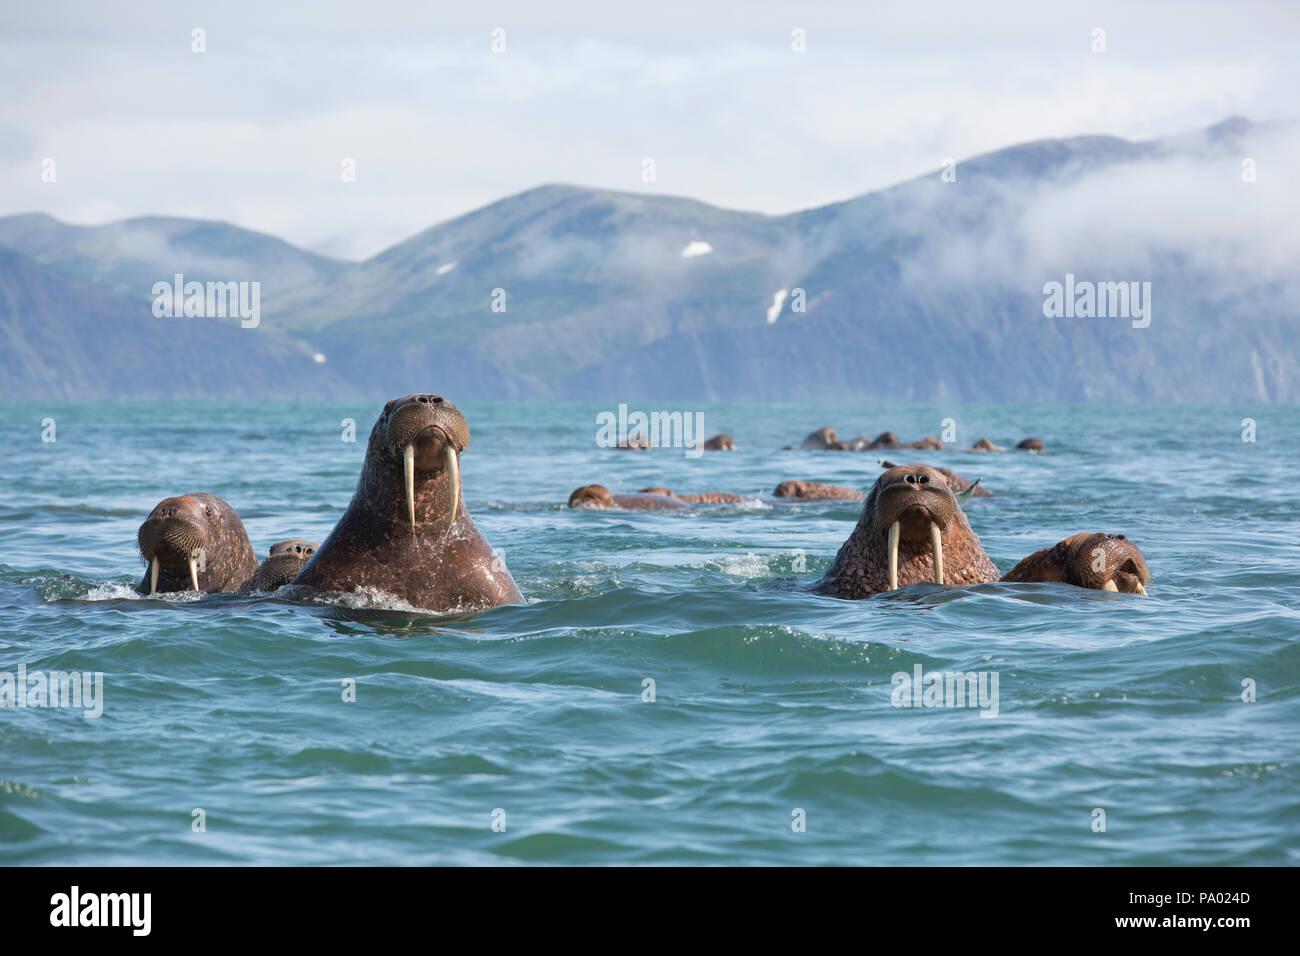 Pacific Walrus (Odobenus rosmarus divergens), Kamchatka, Russia - Stock Image